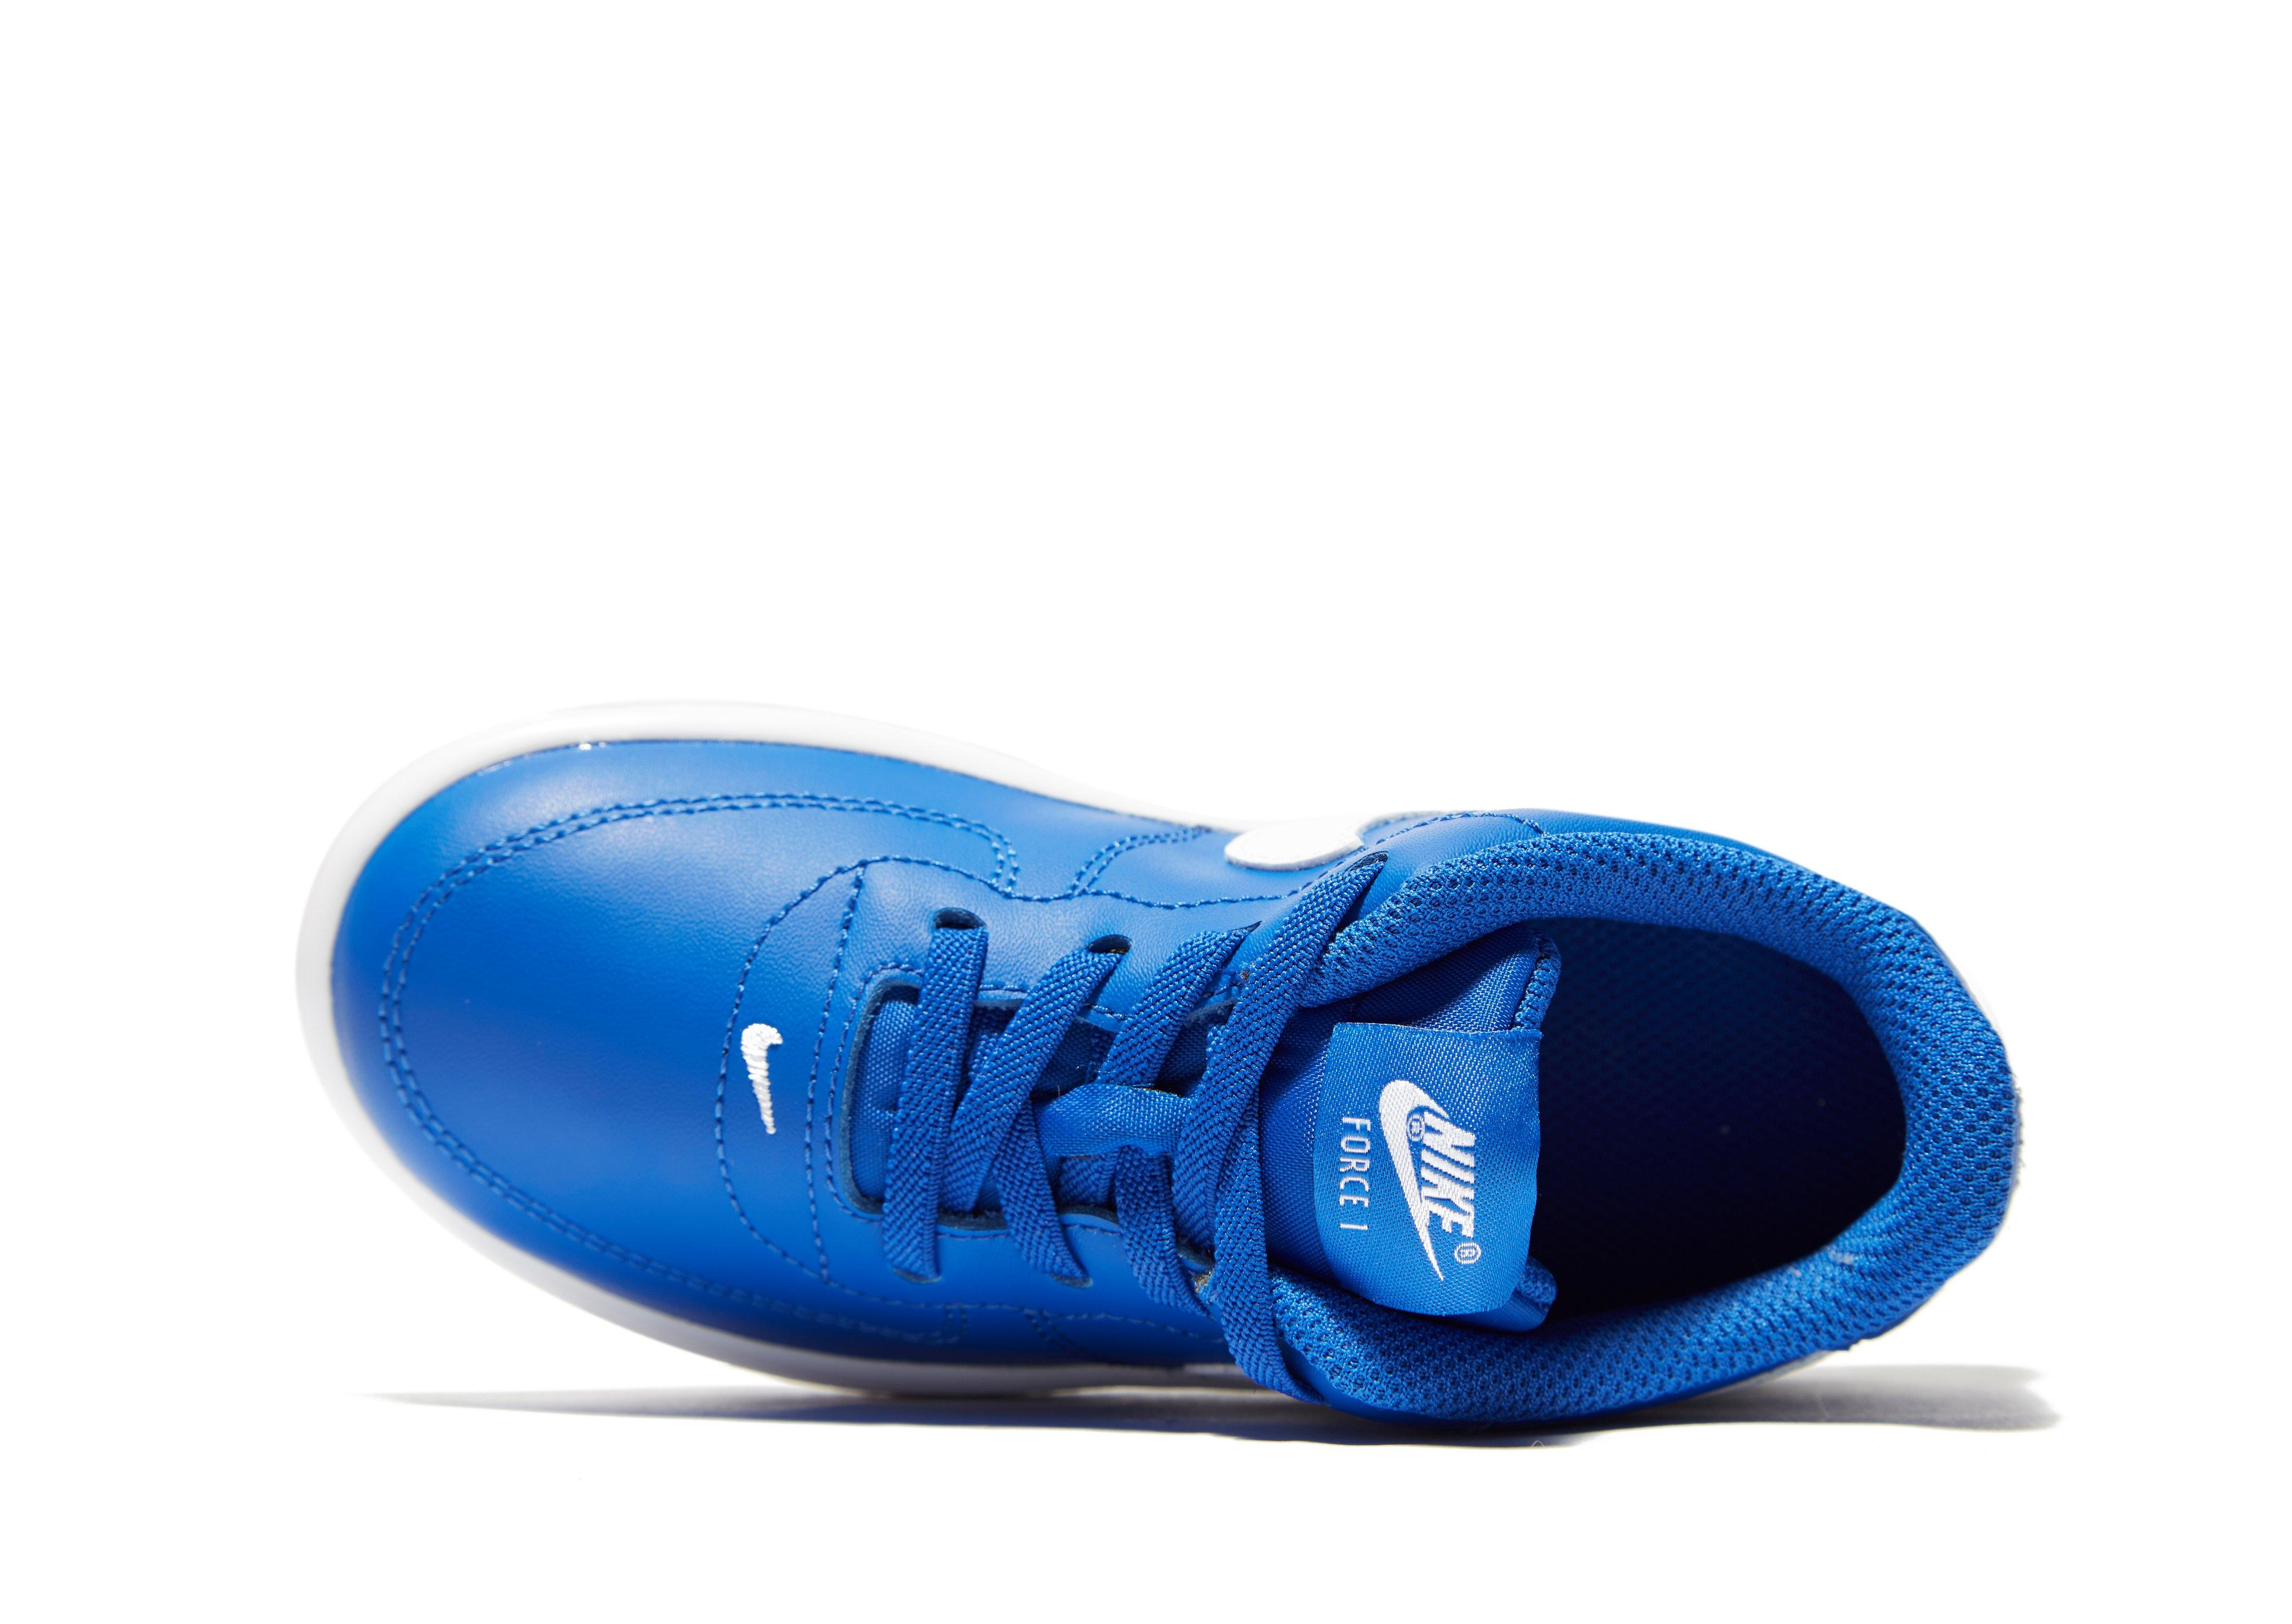 69f0c709cd7b2c Rosa Nike Mercurial Superfly Cr7 Outlet Verkauf Kleinkind Turnschuhe